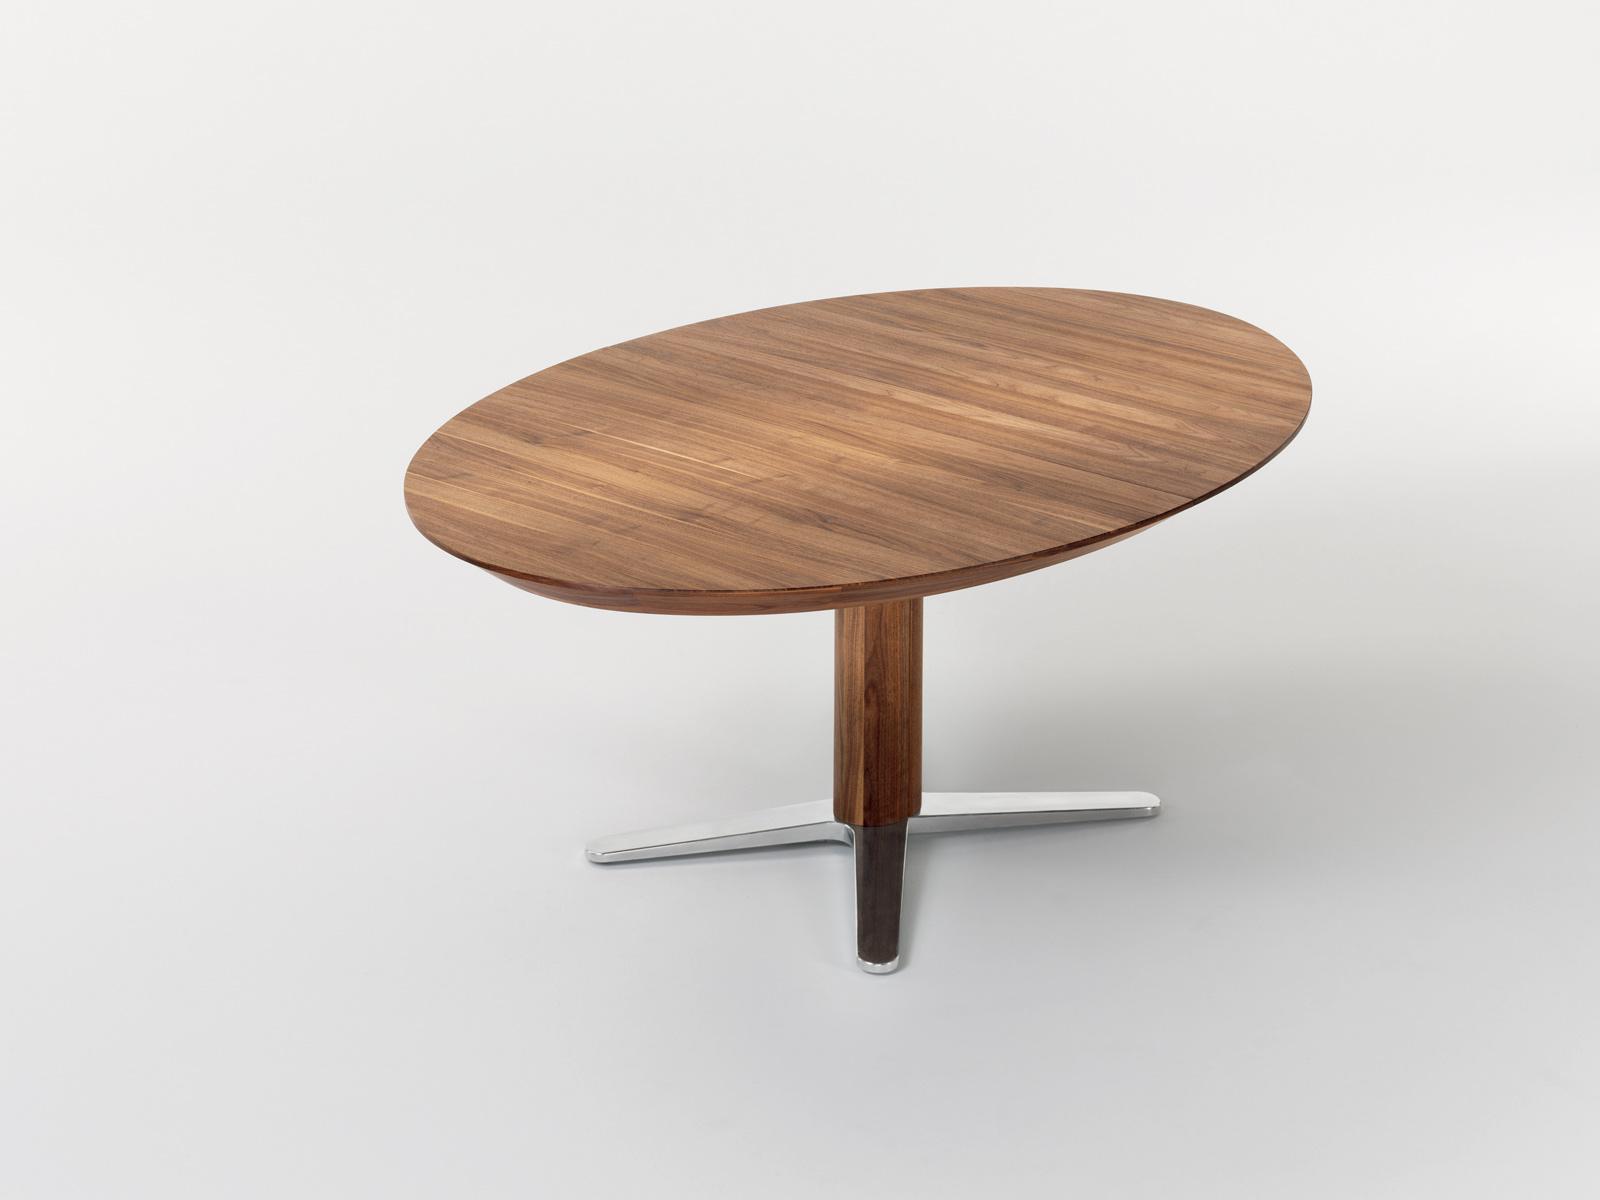 girado tafel noordkaap meubelen. Black Bedroom Furniture Sets. Home Design Ideas